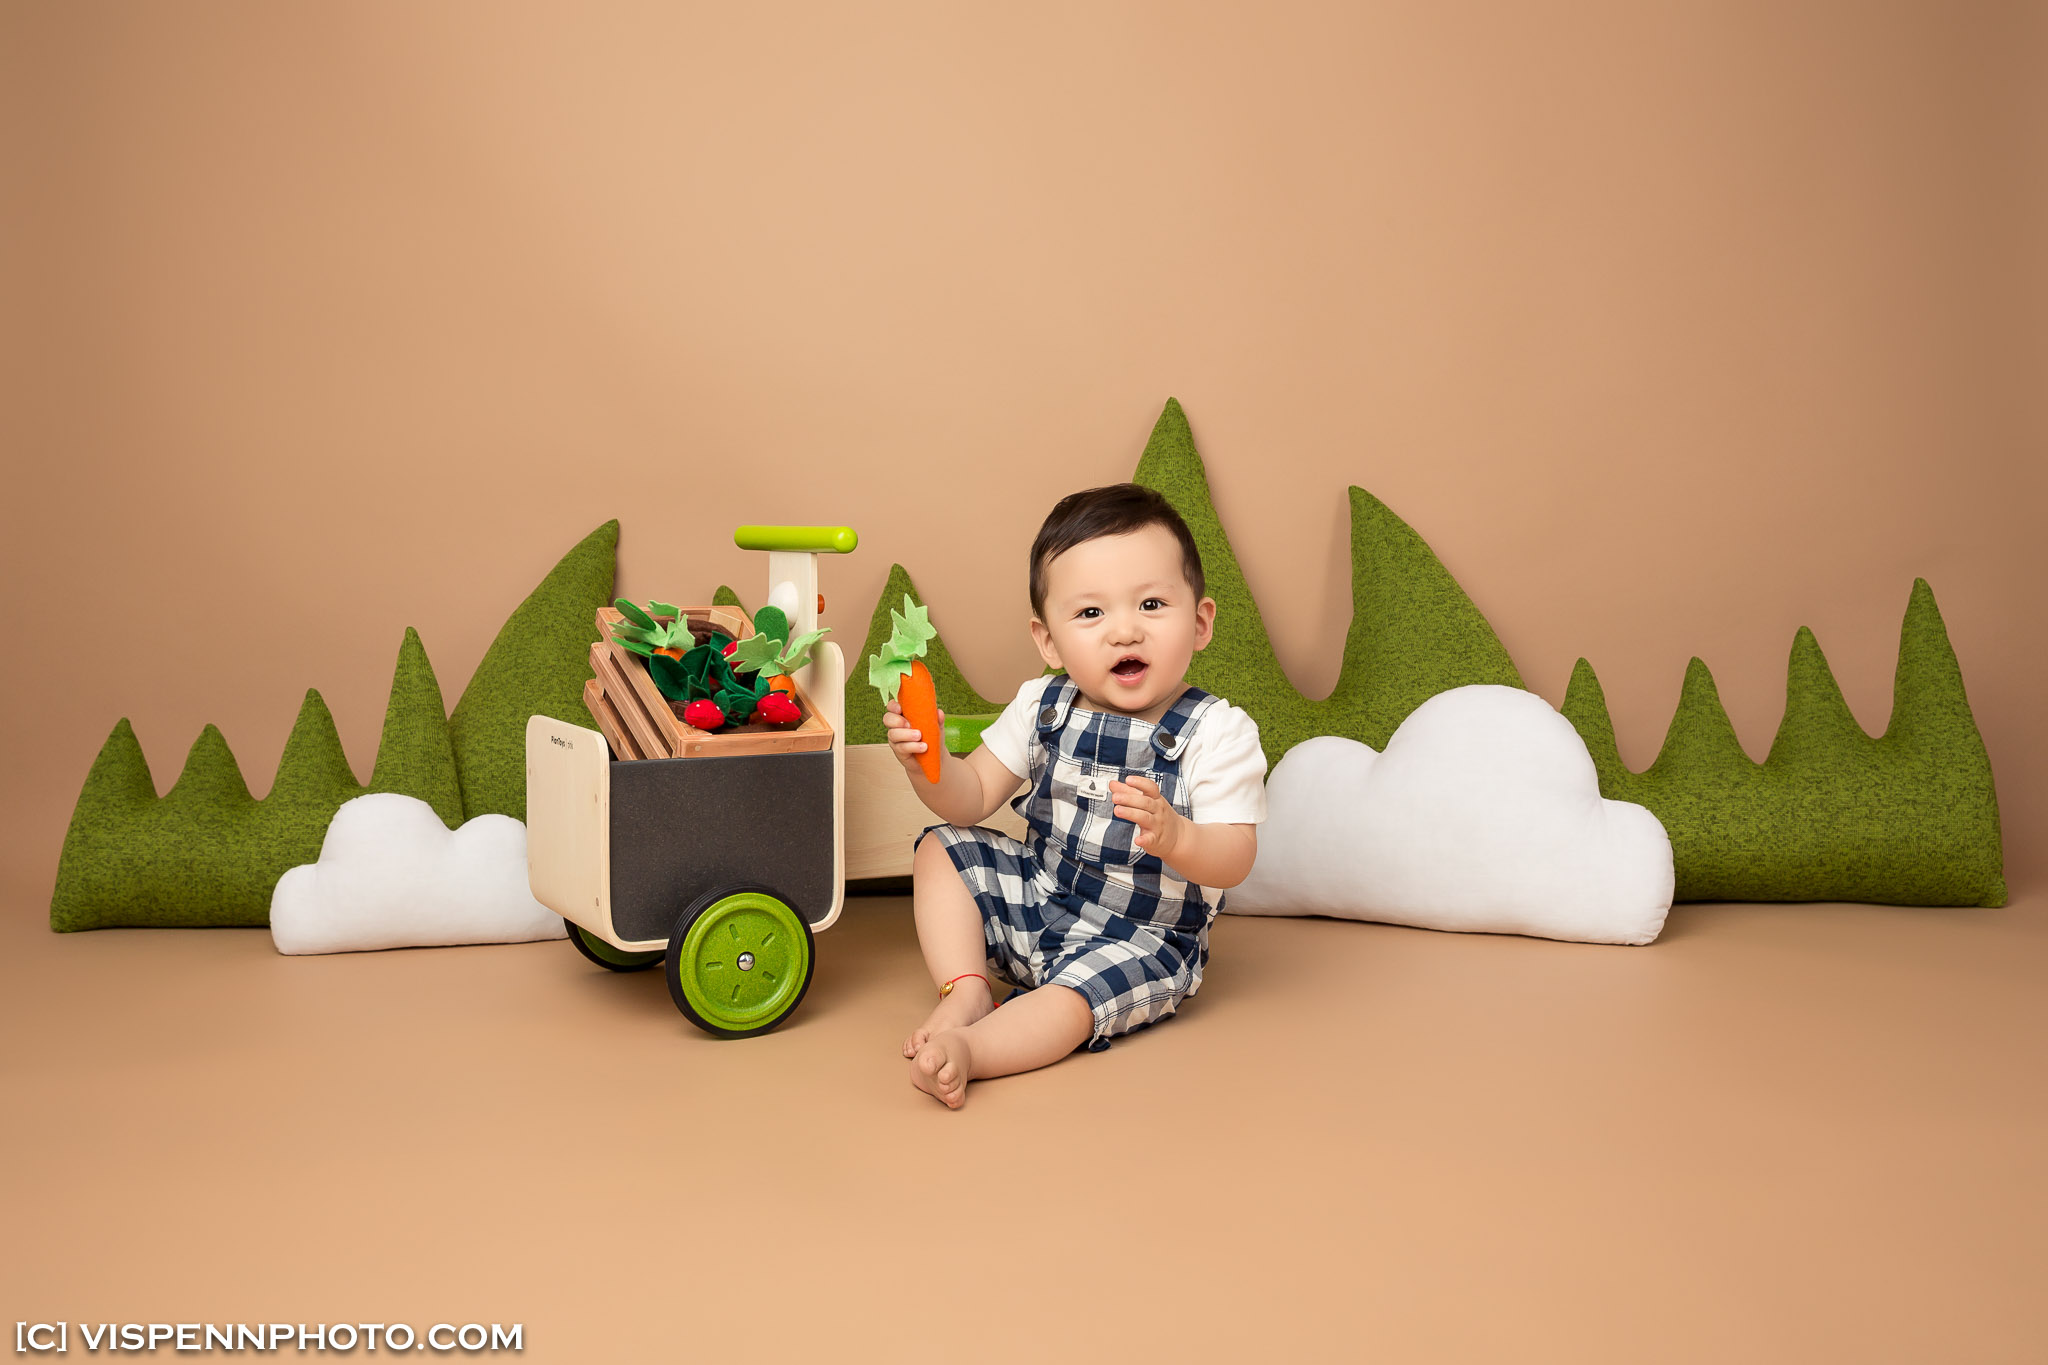 Melbourne Newborn Baby Family Photo BaoBao VISPENN 墨尔本 儿童 宝宝 百天照 满月照 孕妇照 全家福 KIDS VISPENN IvyZou 1635